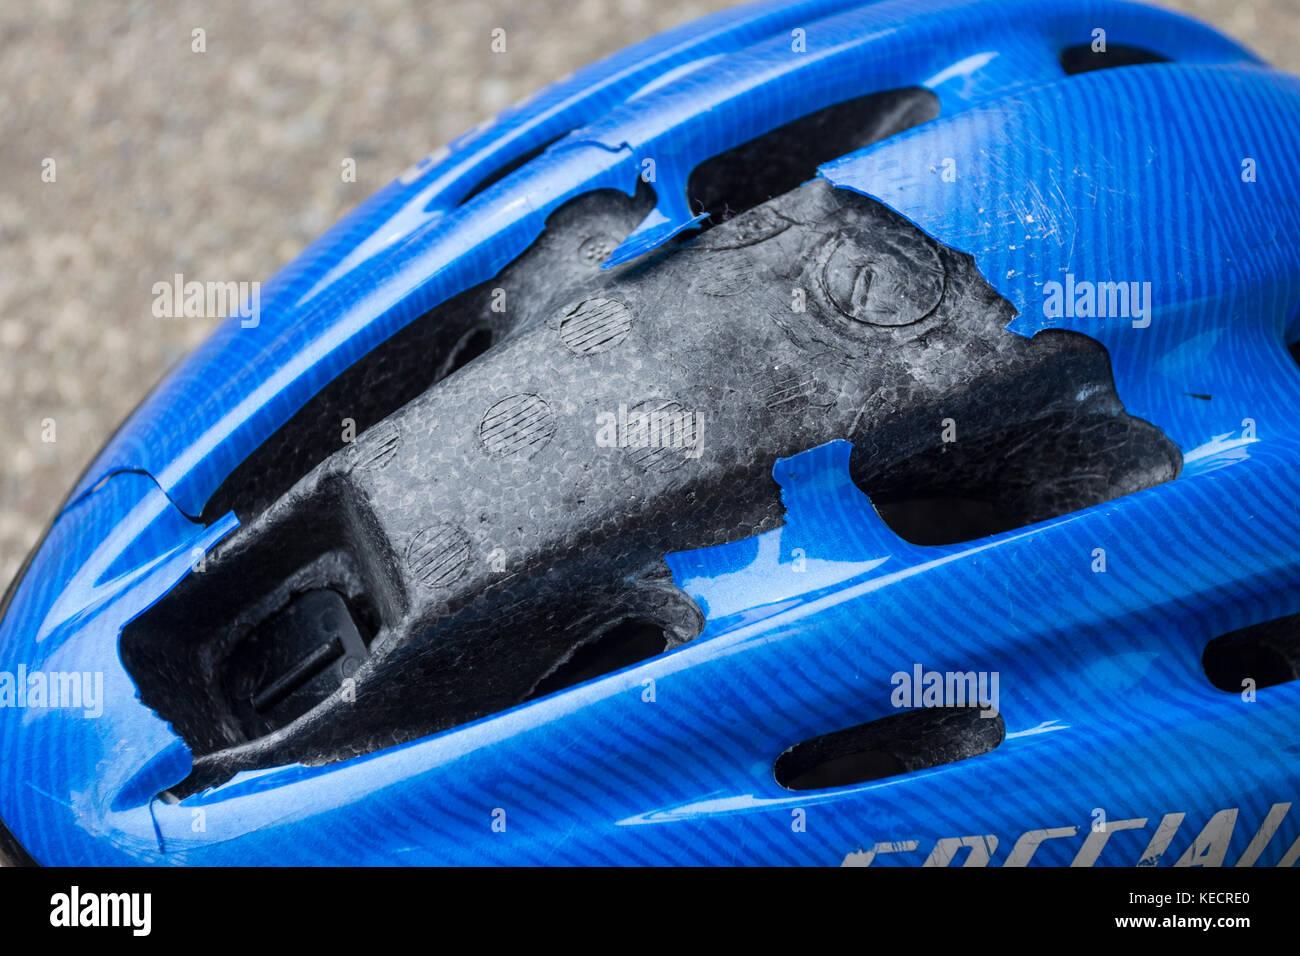 Impact Damaged Cycling Helmet - Stock Image